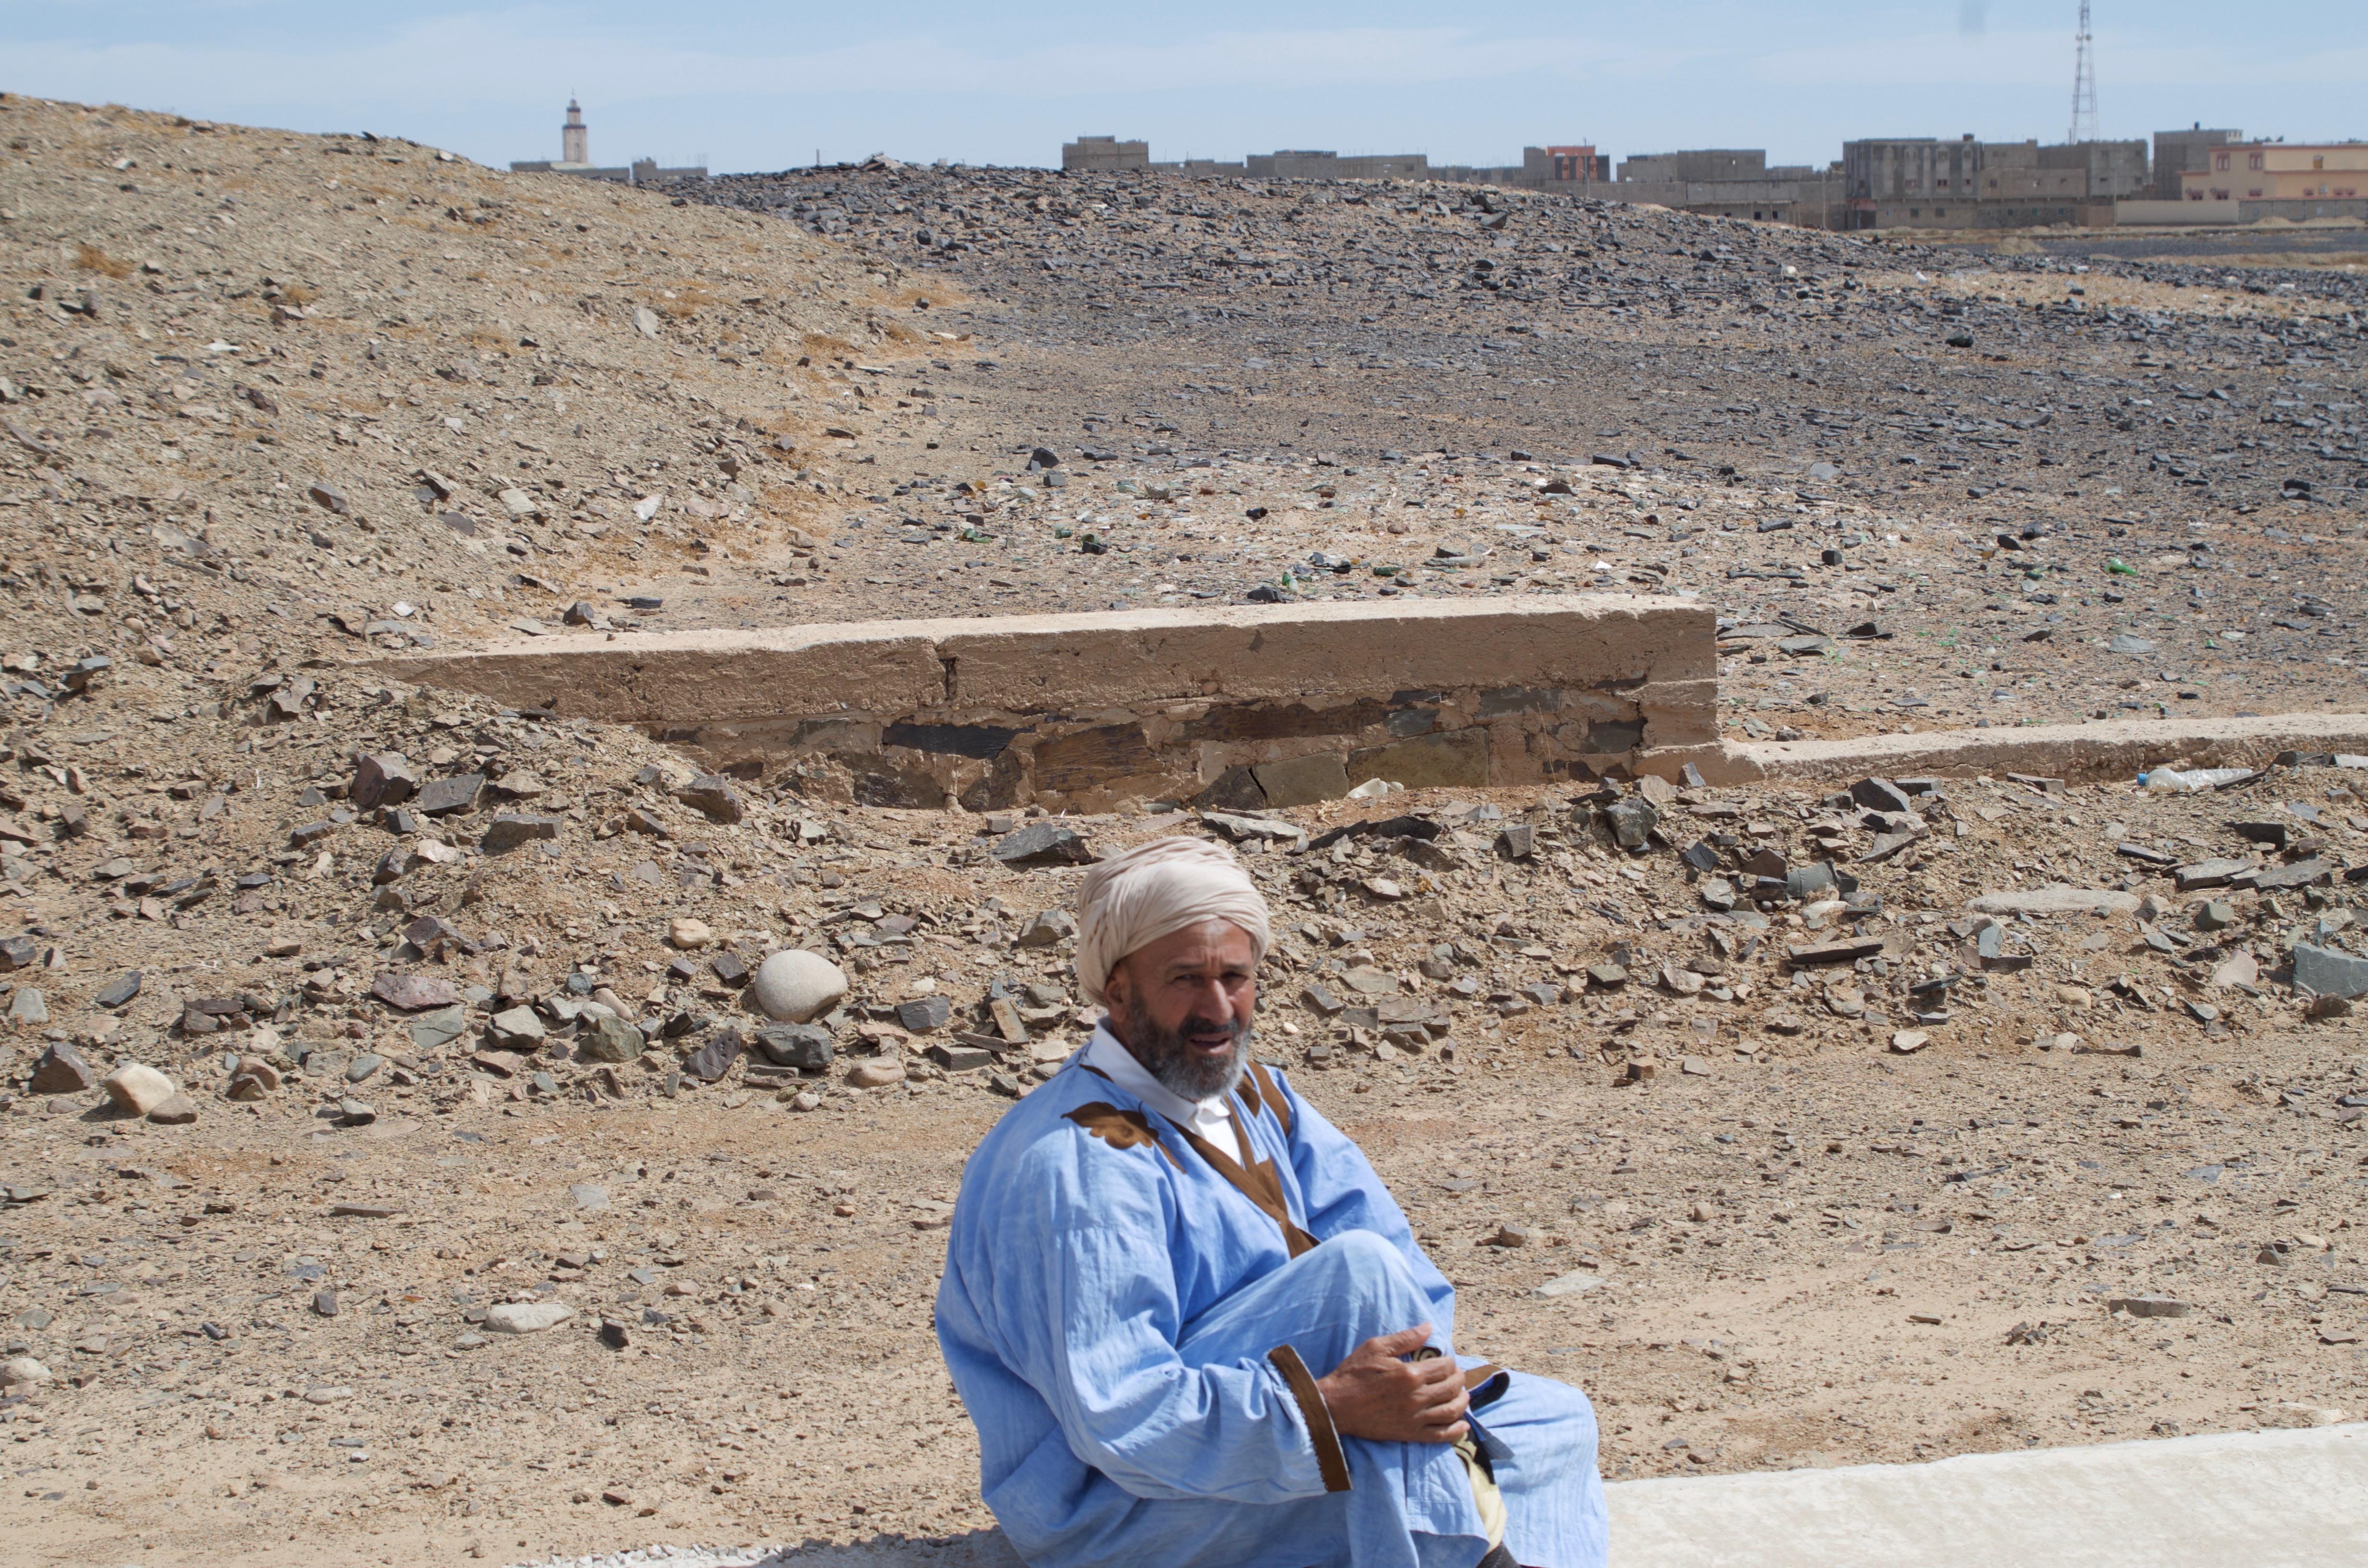 A Saharawi praying in the desert of Smara.